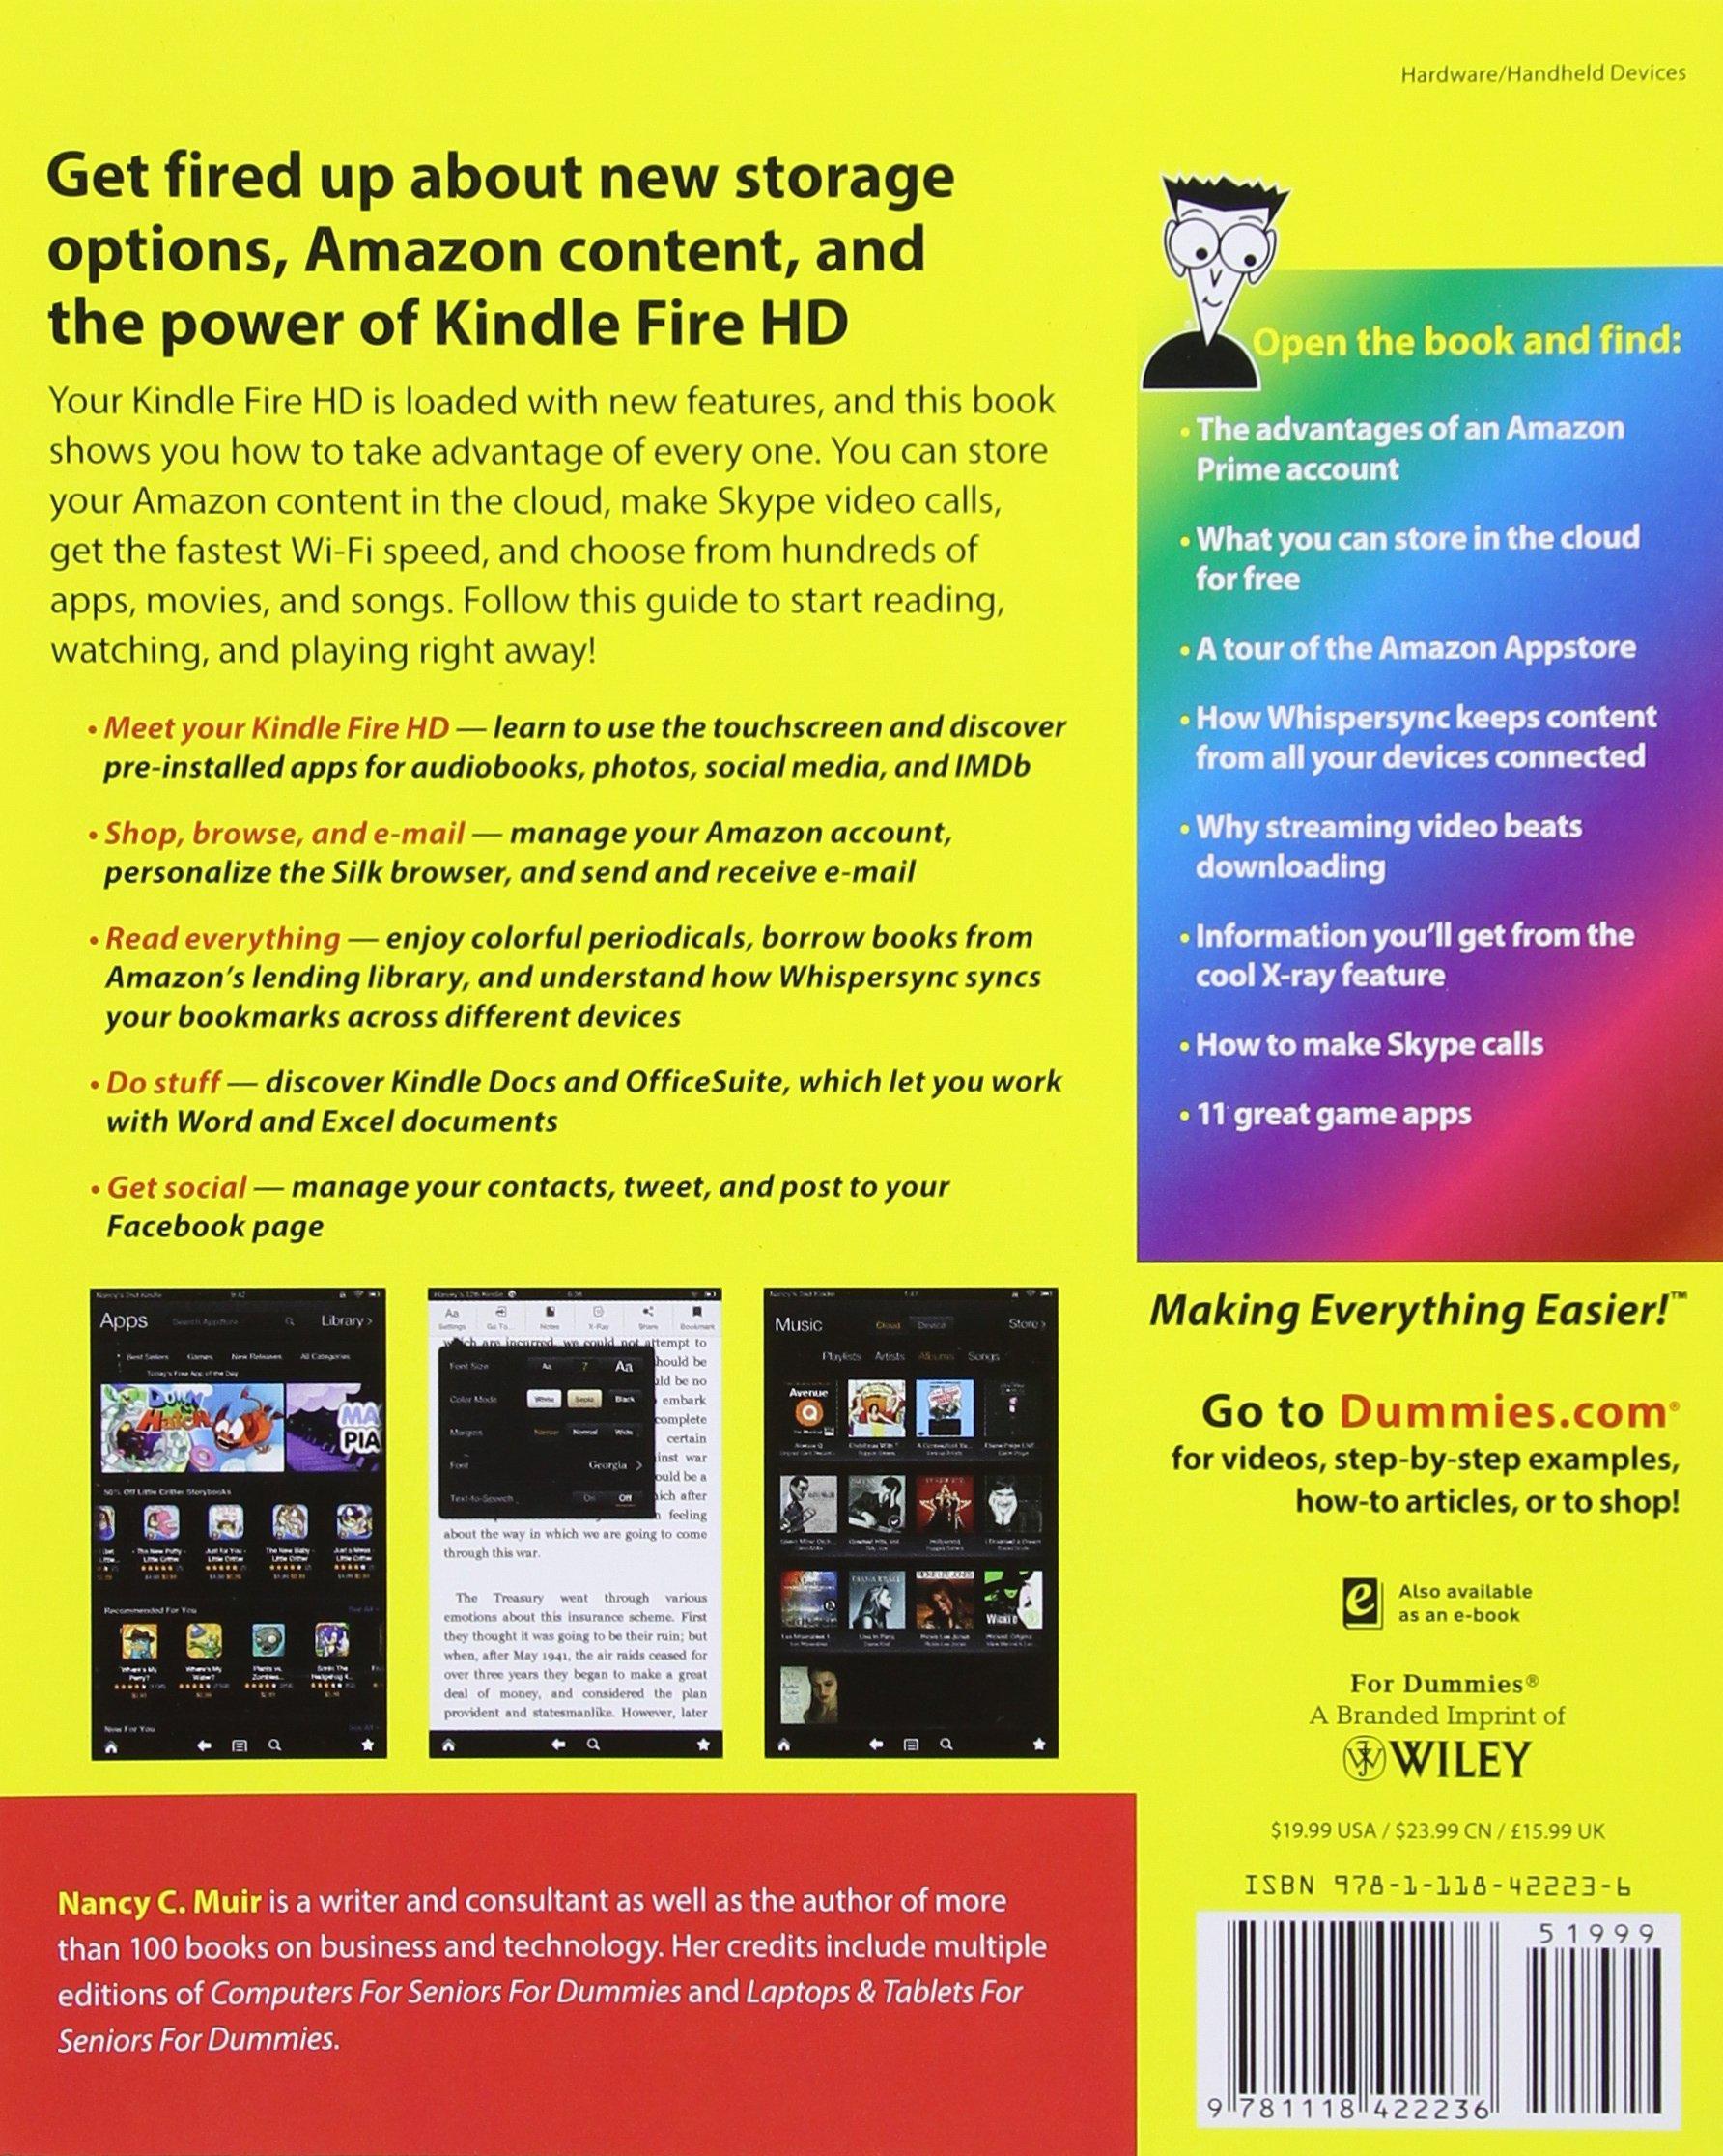 Kindle Fire Hd for Dummies: Amazon.co.uk: Nancy C. Muir: 9781118530757:  Books